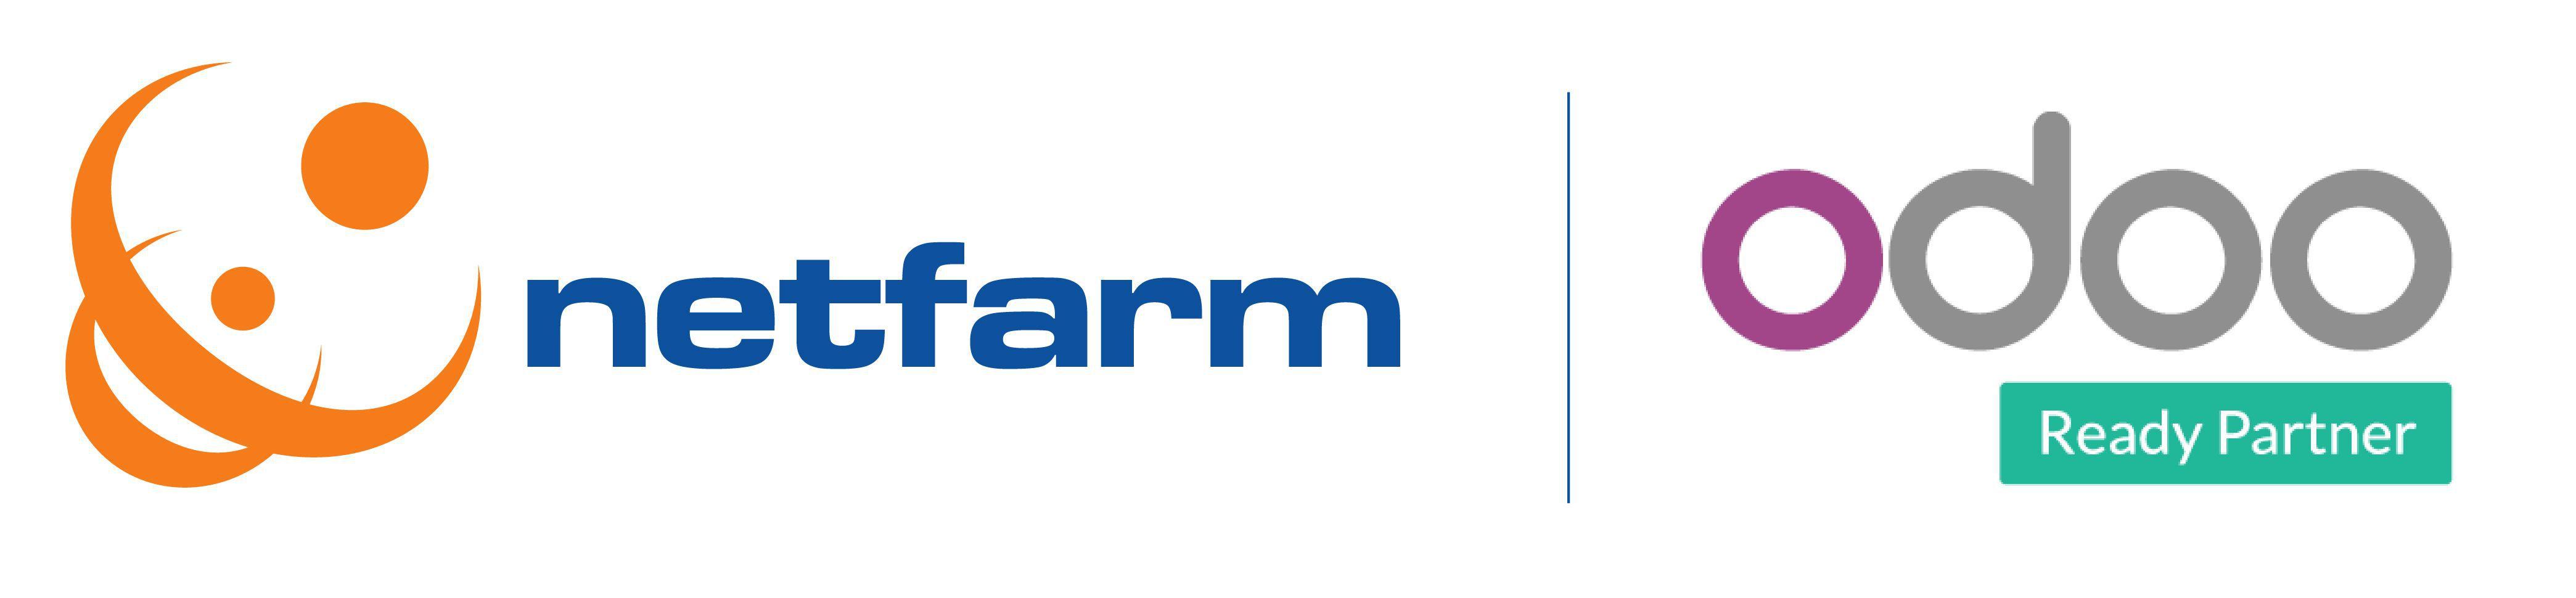 logo Netfarm partner Odoo